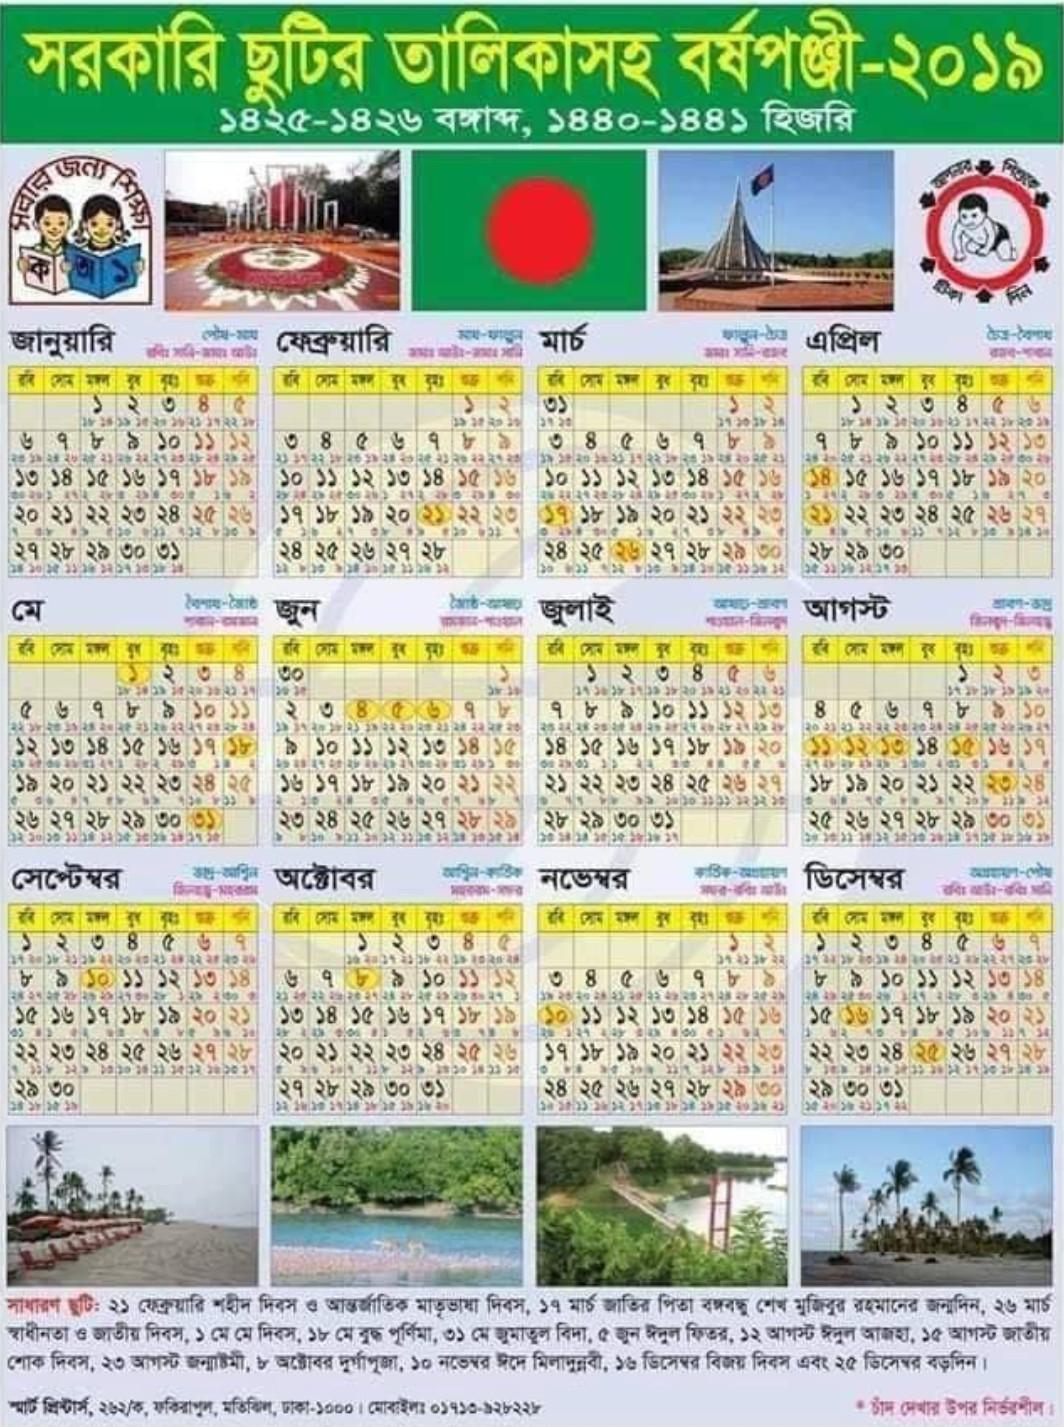 Bangla Calendar 2019 - Bengali Calendar 1426 pdf download